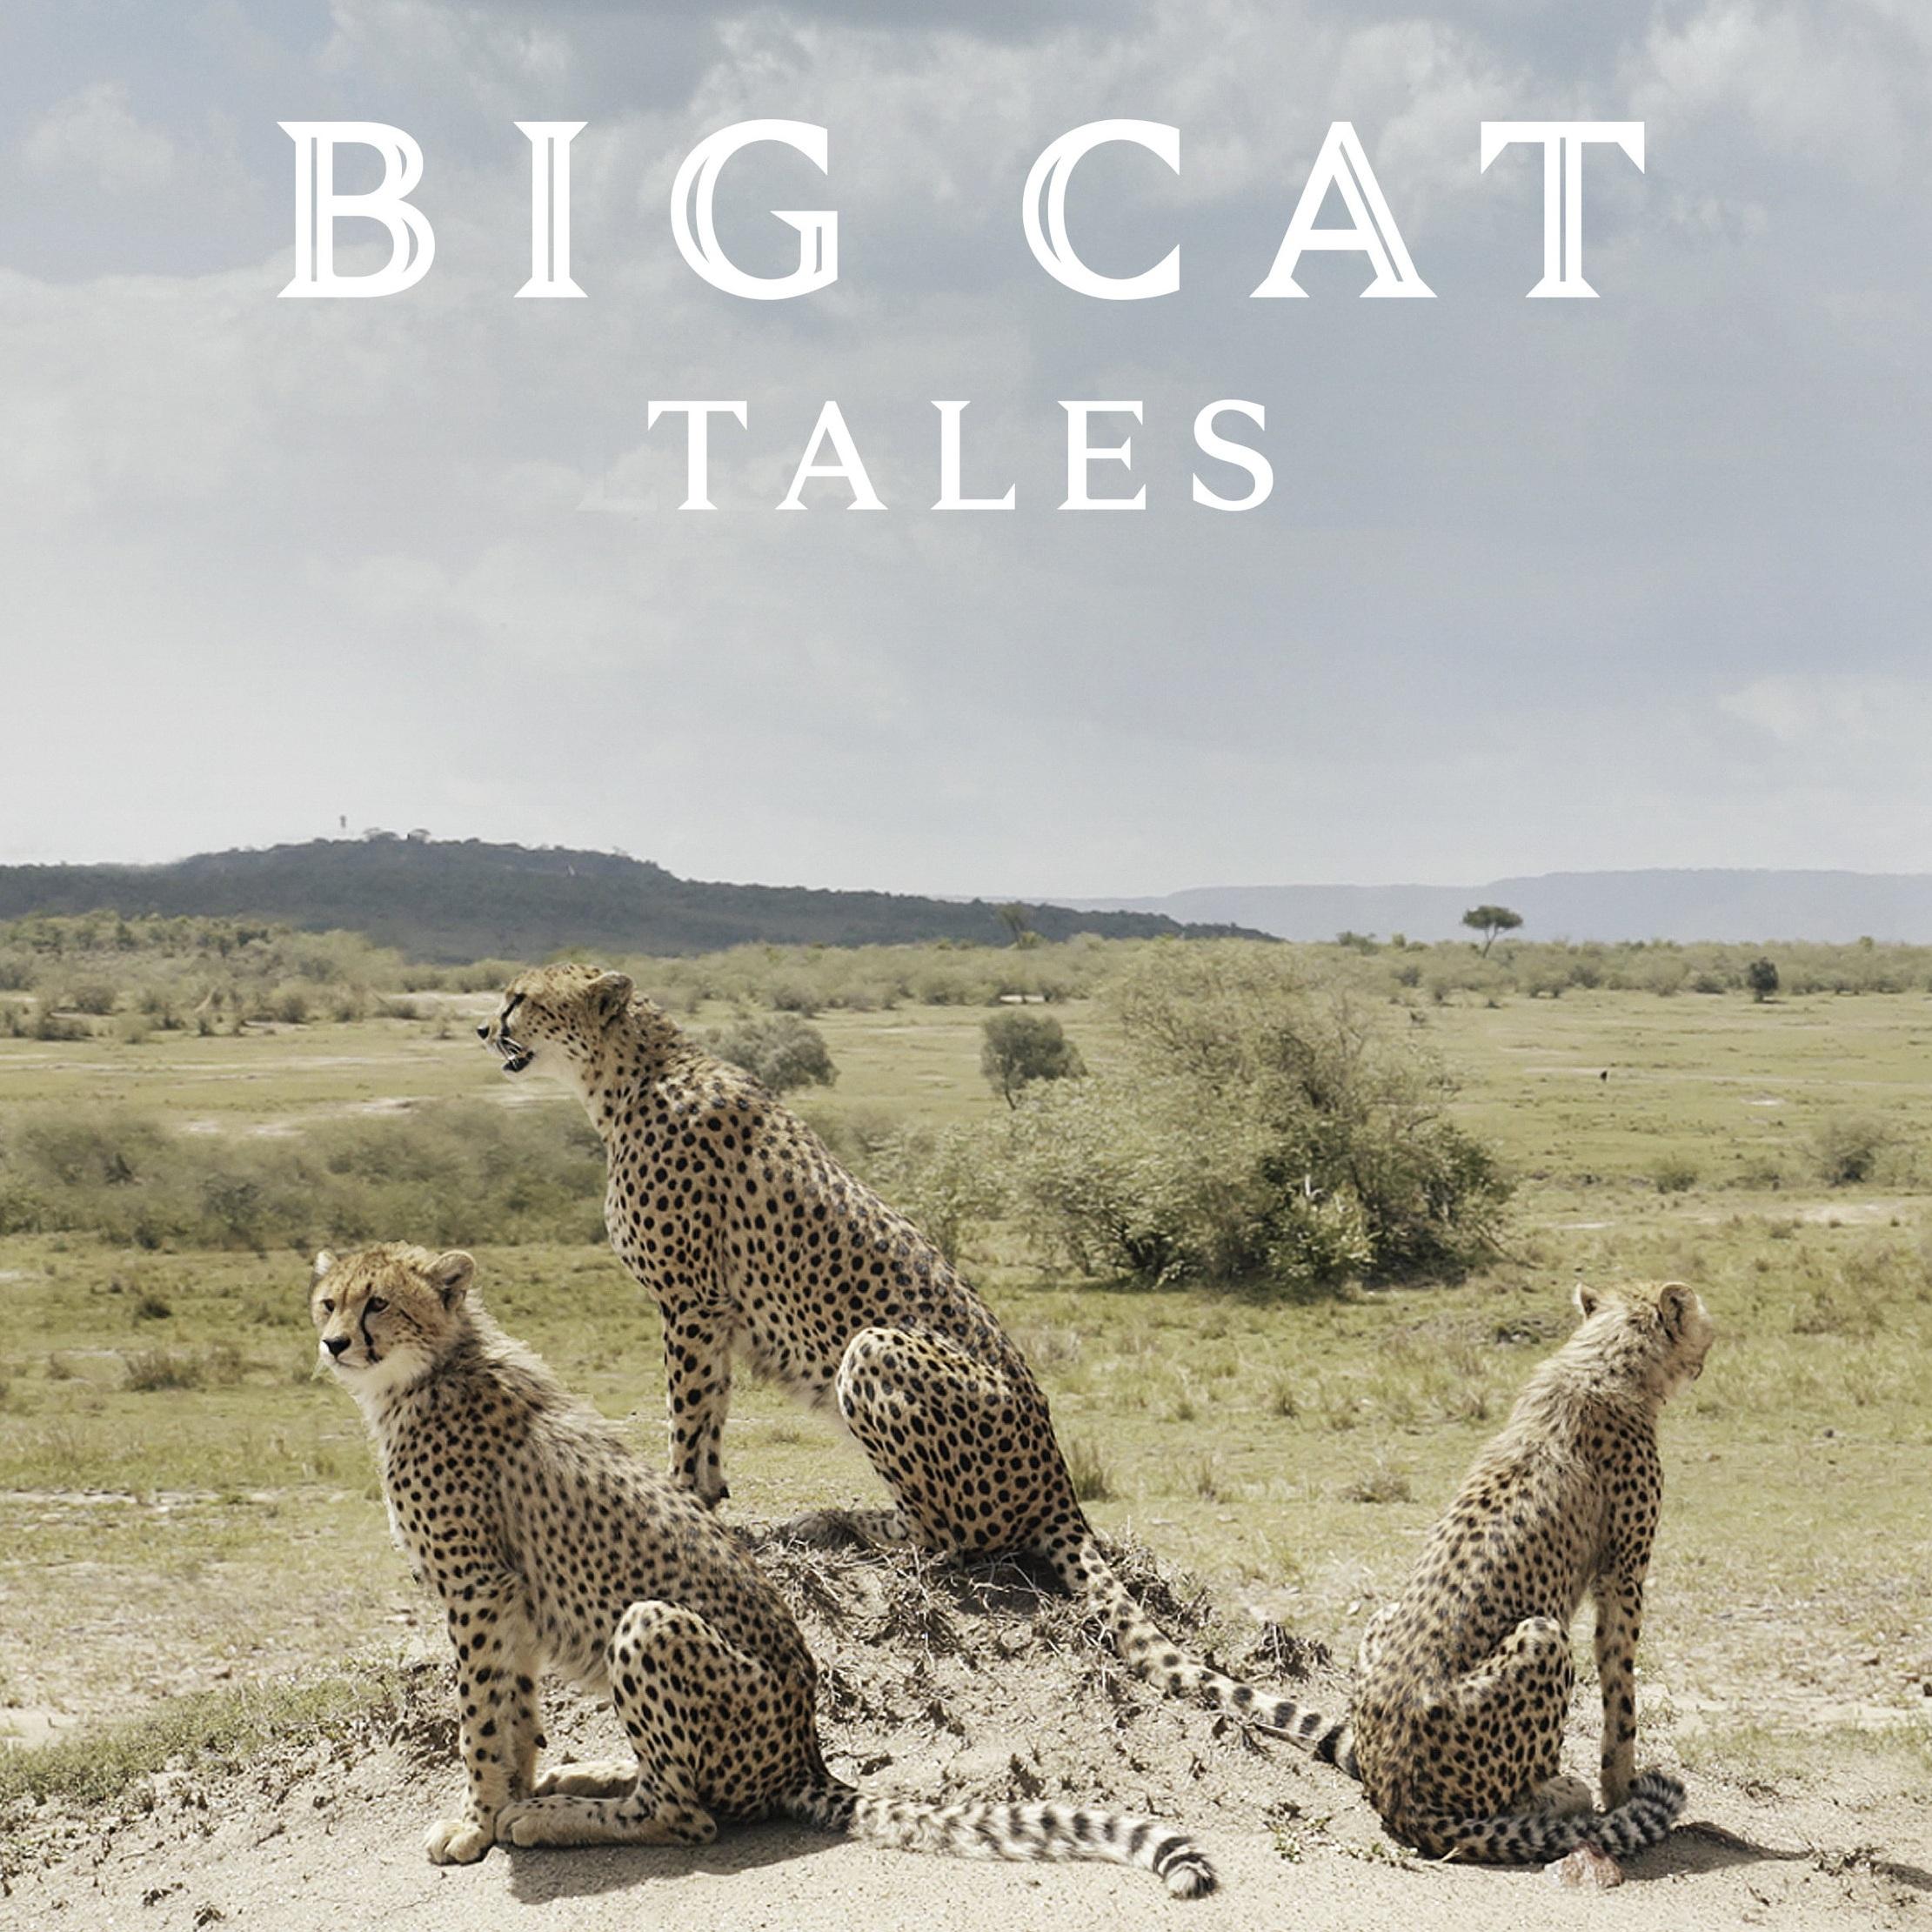 BigCatTales.jpg